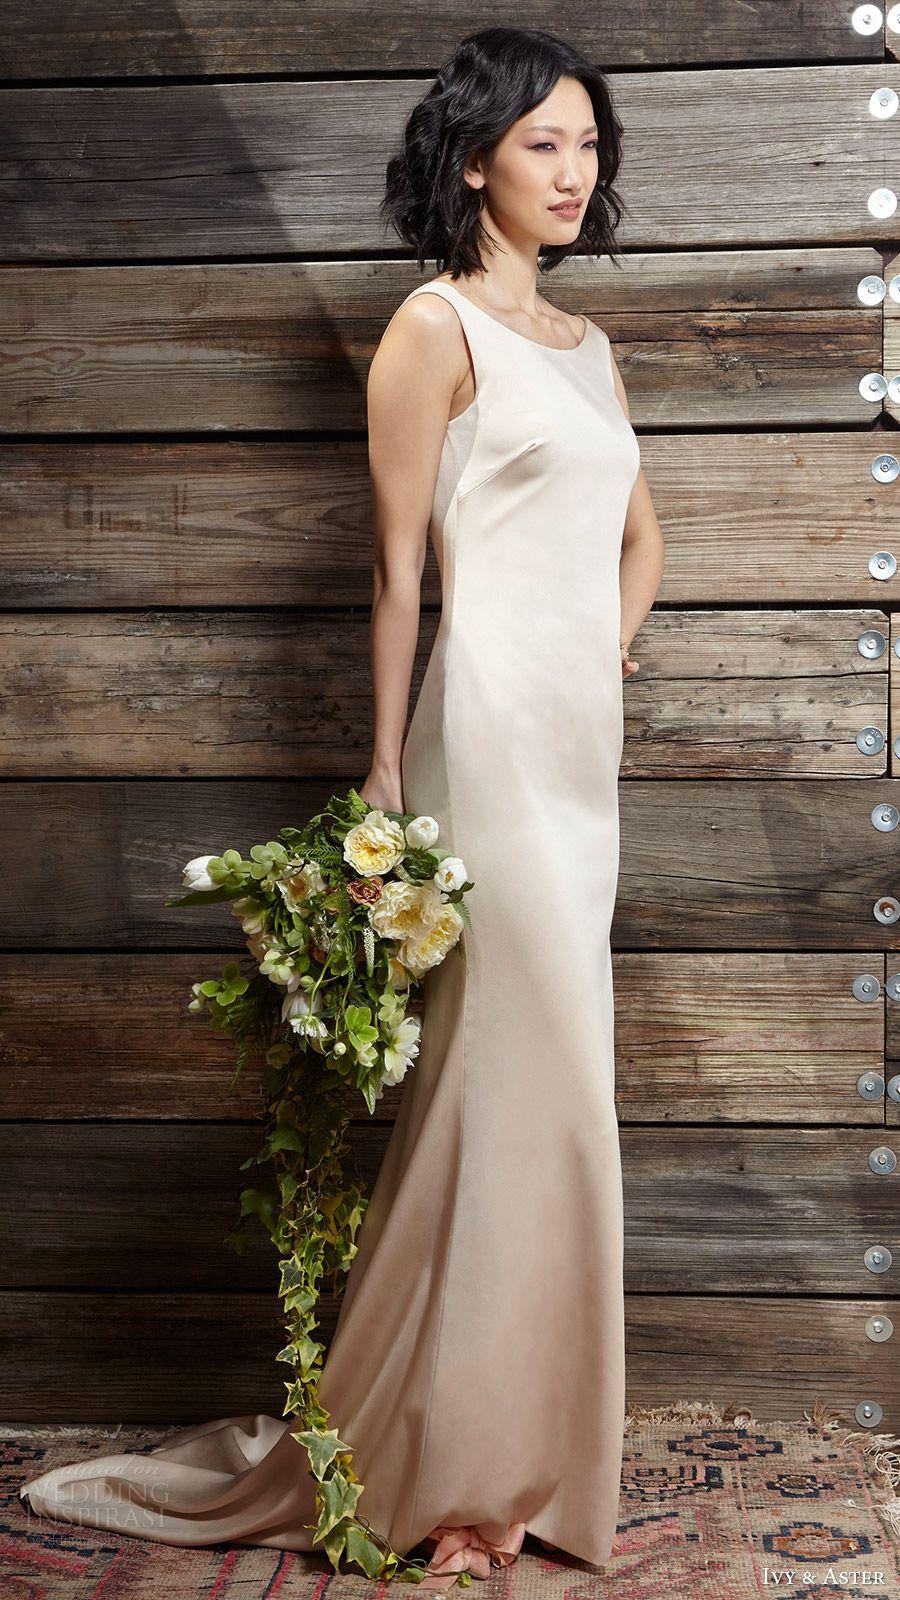 Wedding dress slip  Ivy u Aster Spring  Wedding Dresses u ucA Moment in Timeud Bridal